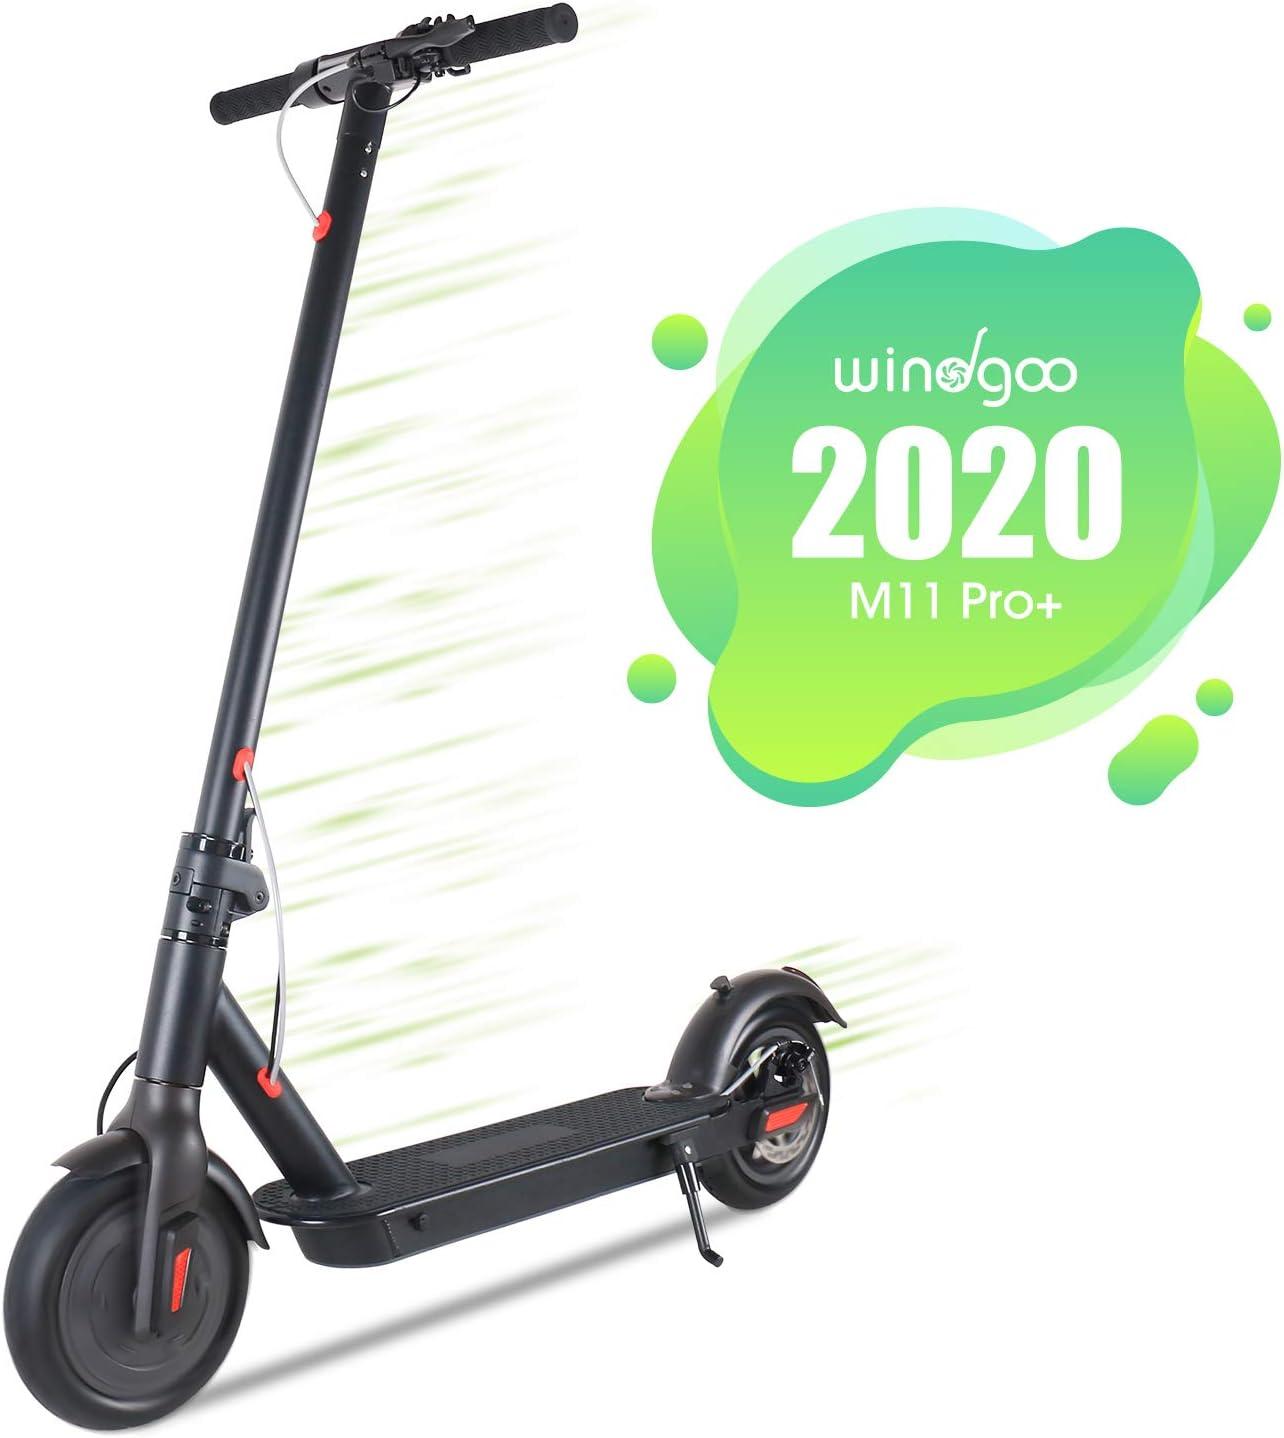 Windgoo Patinete Eléctrico Plegable E Scooter, hasta 25 km/h, Batería de Largo Alcance de 20-22km 36V 6AH, Neumático de 8.5 Pulgadas (Gris Oscuro Mate)